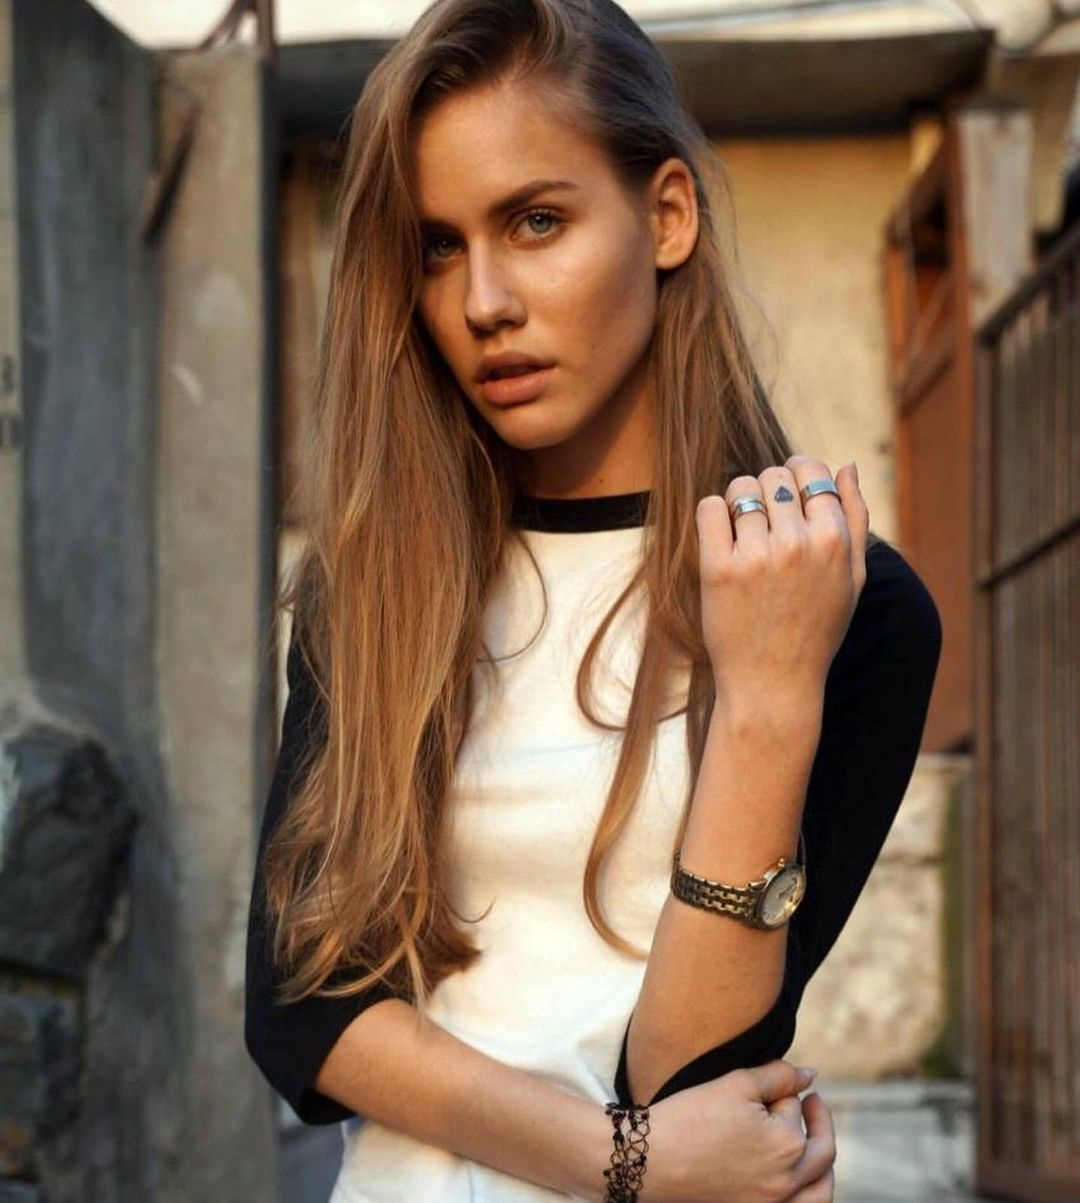 Alina-Efimova-Wallpapers-Insta-Fit-Bio-5